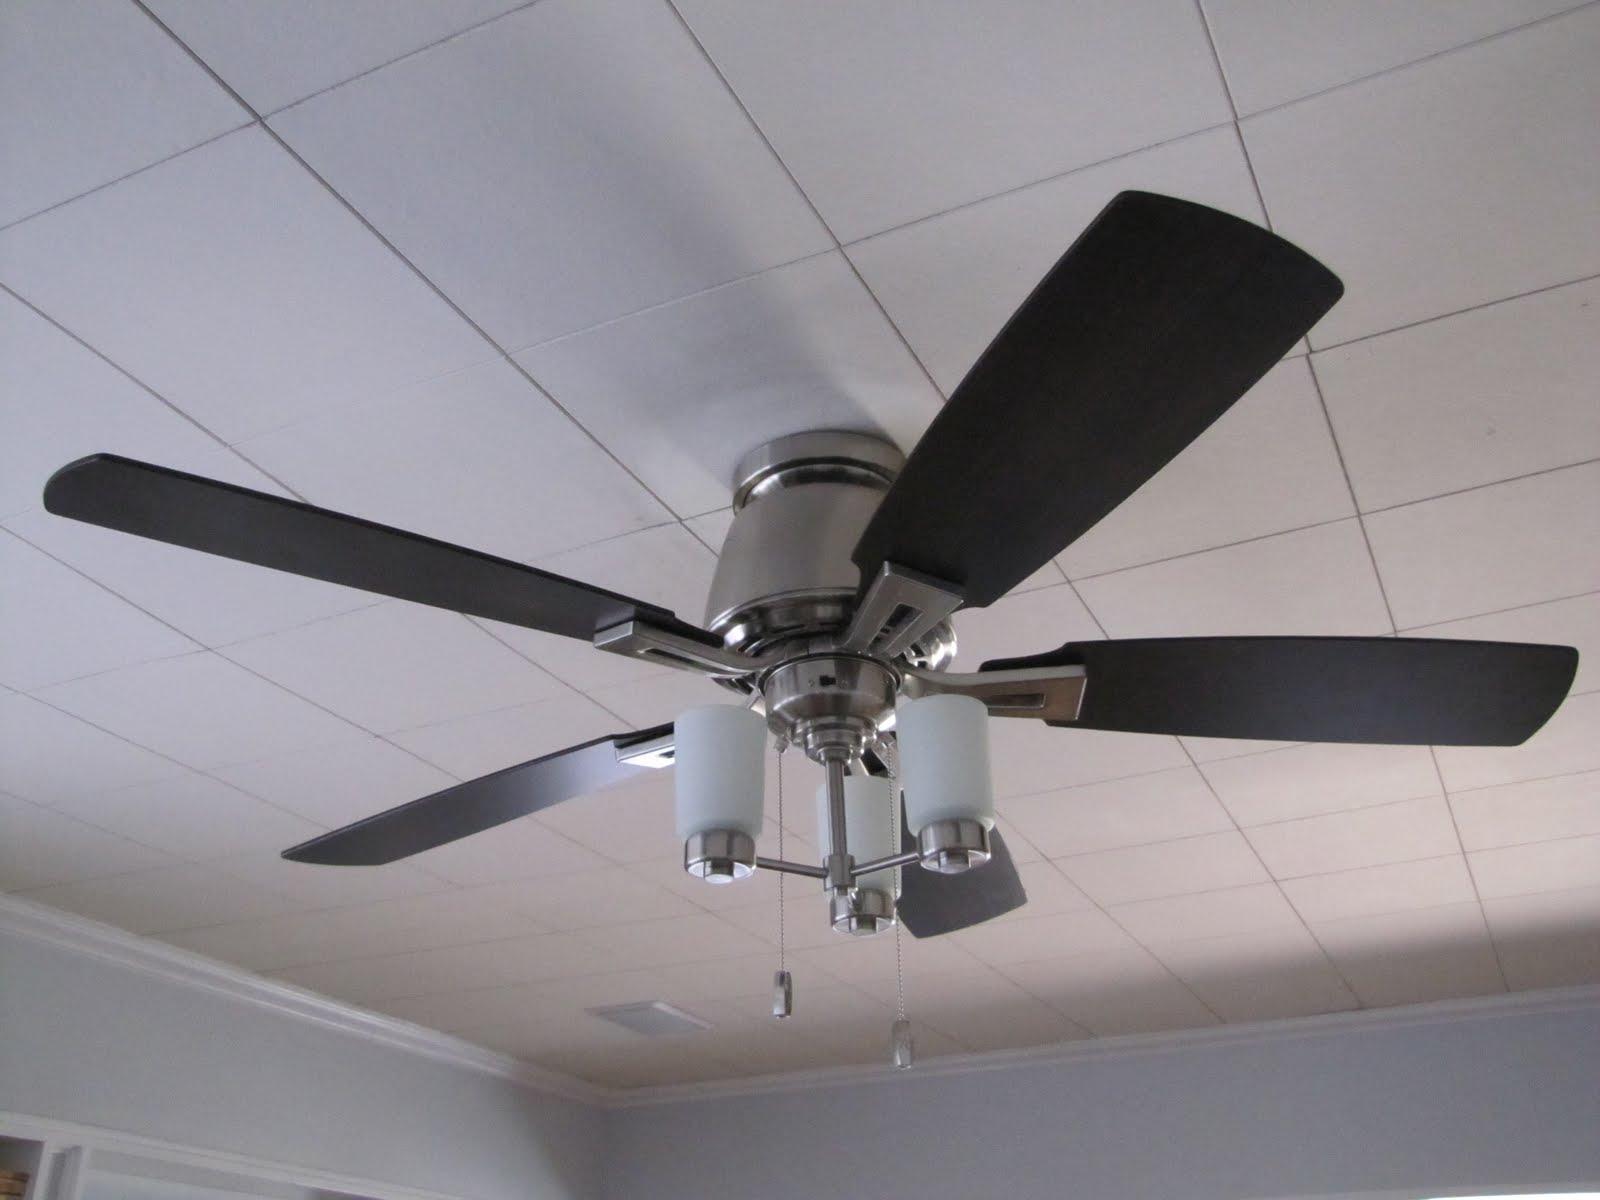 hight resolution of ceiling light fan grey steel white